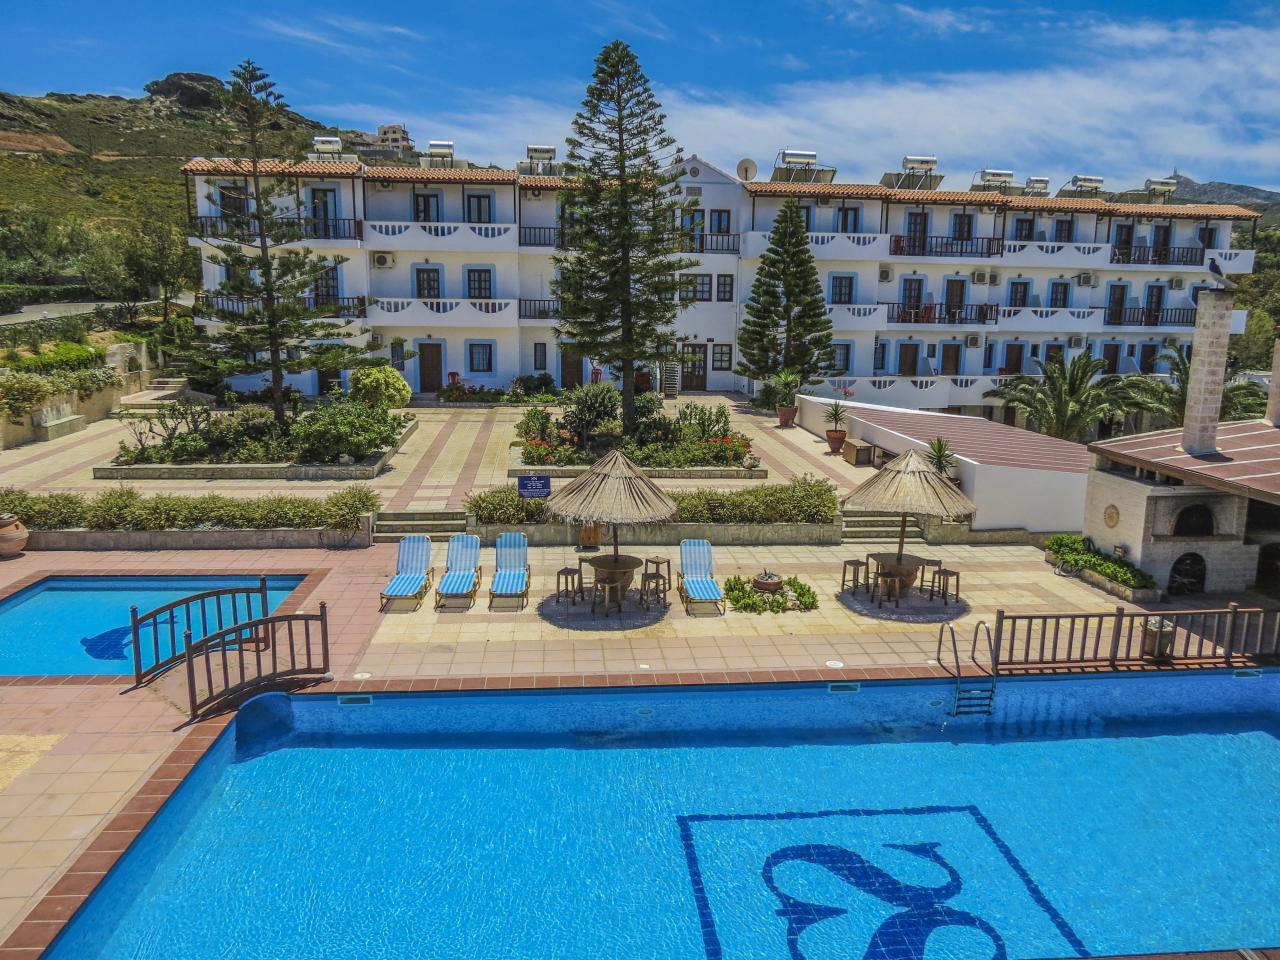 Spiros - Soula Family Hotel & Apts